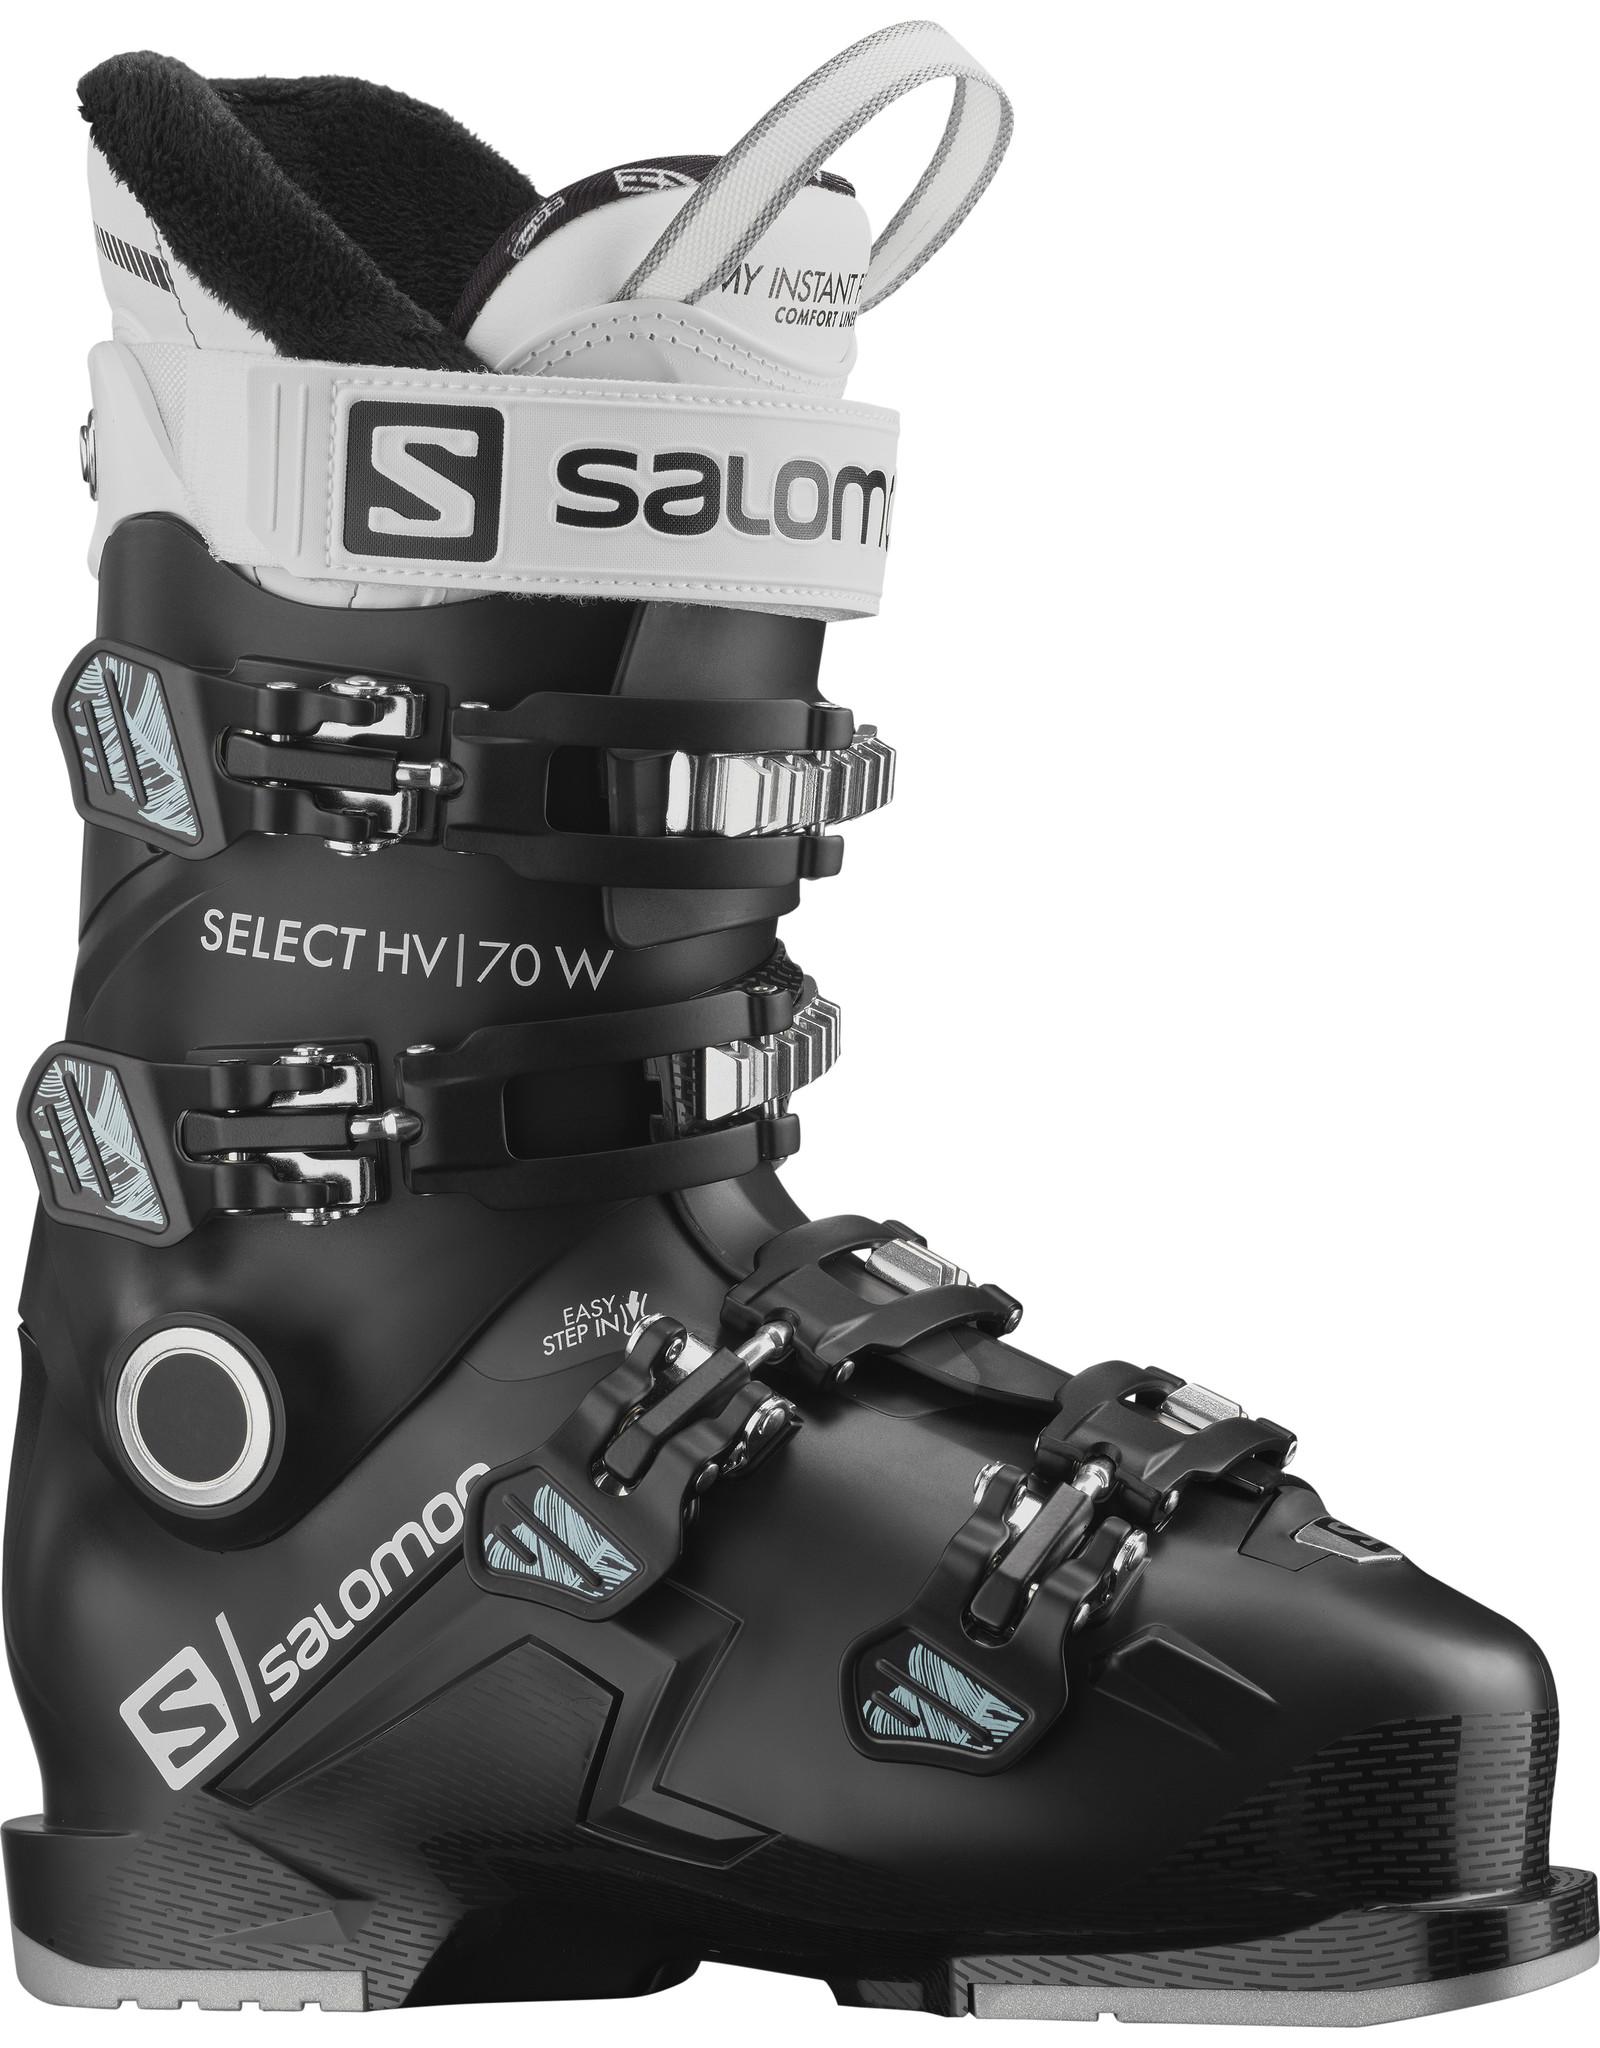 Salomon SELECT HV 70 W BLACK/Sterling